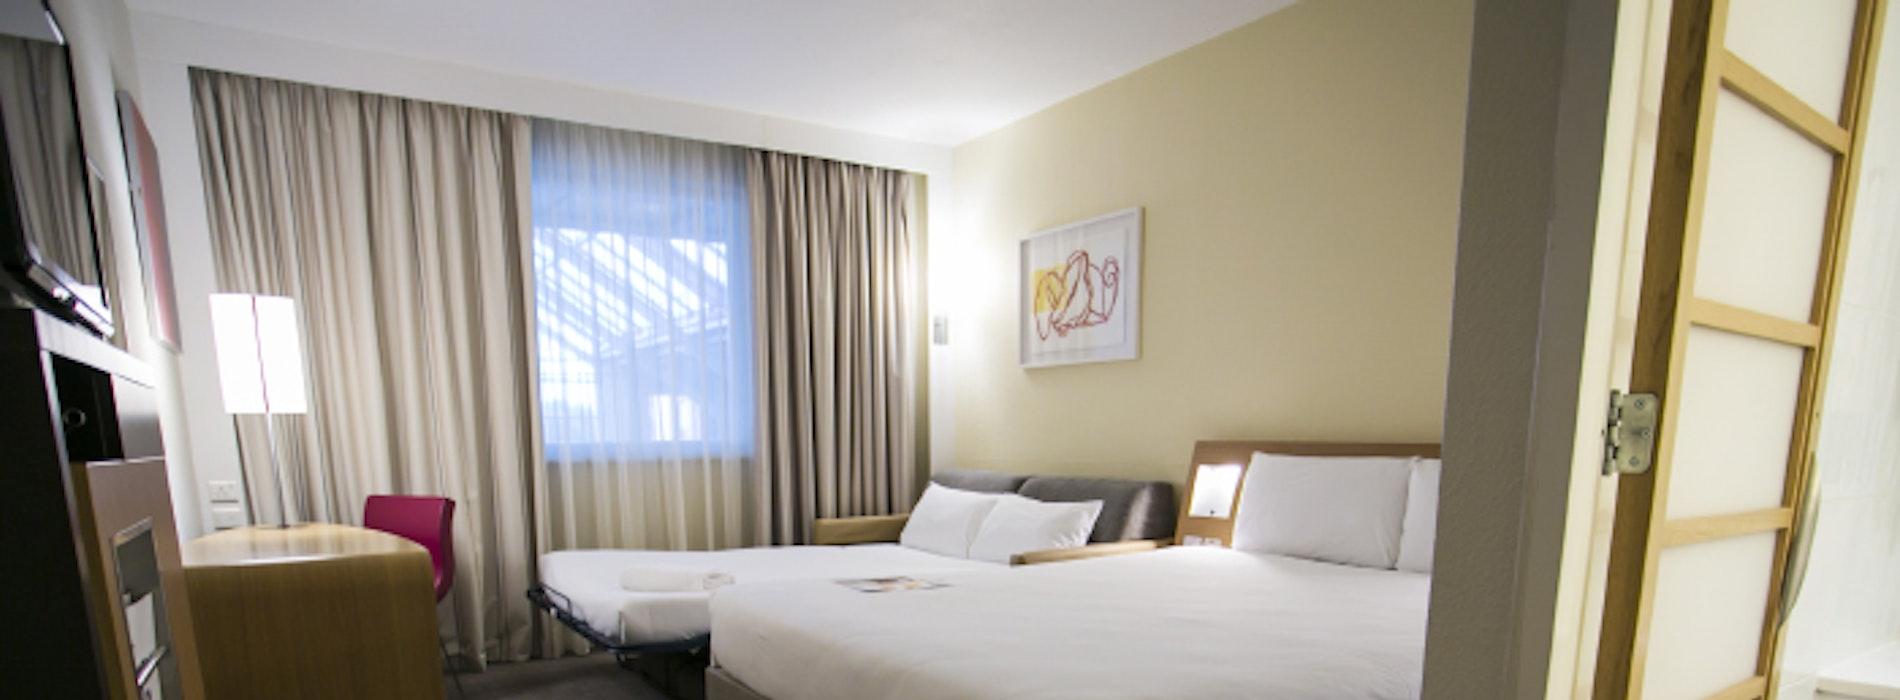 Novotel Heathrow hotel near Legoland Windsor Resort